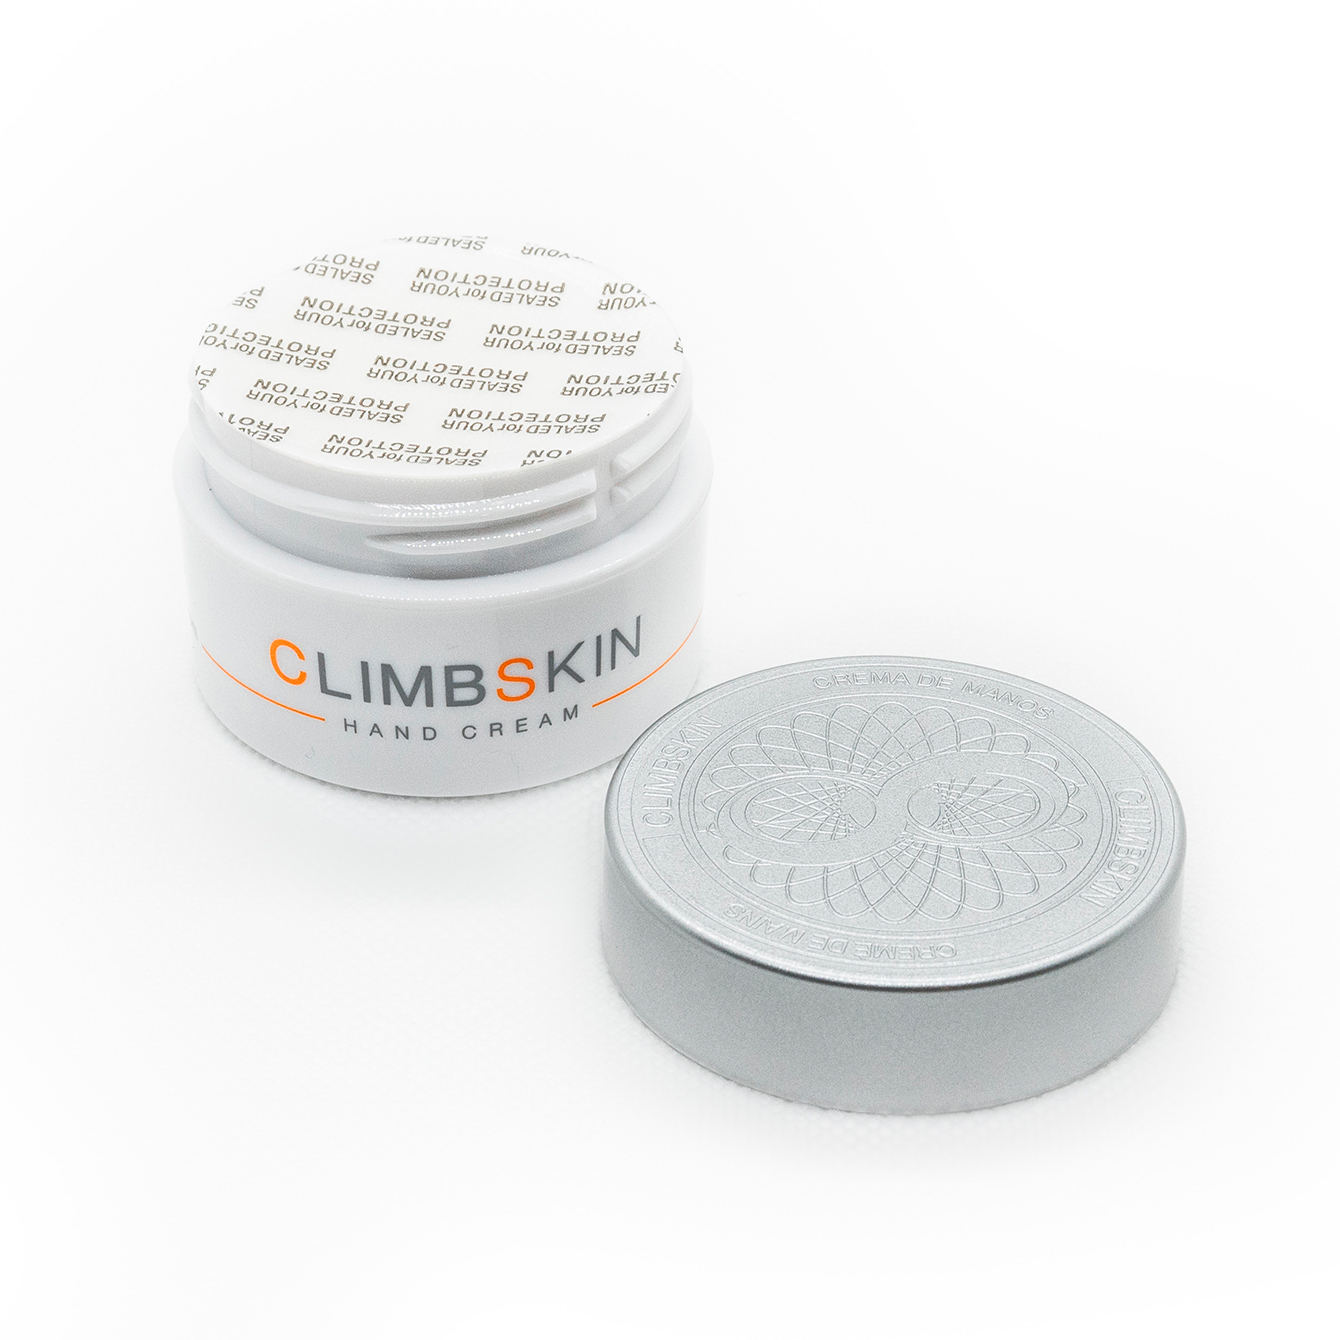 Climbskin Hand Cream